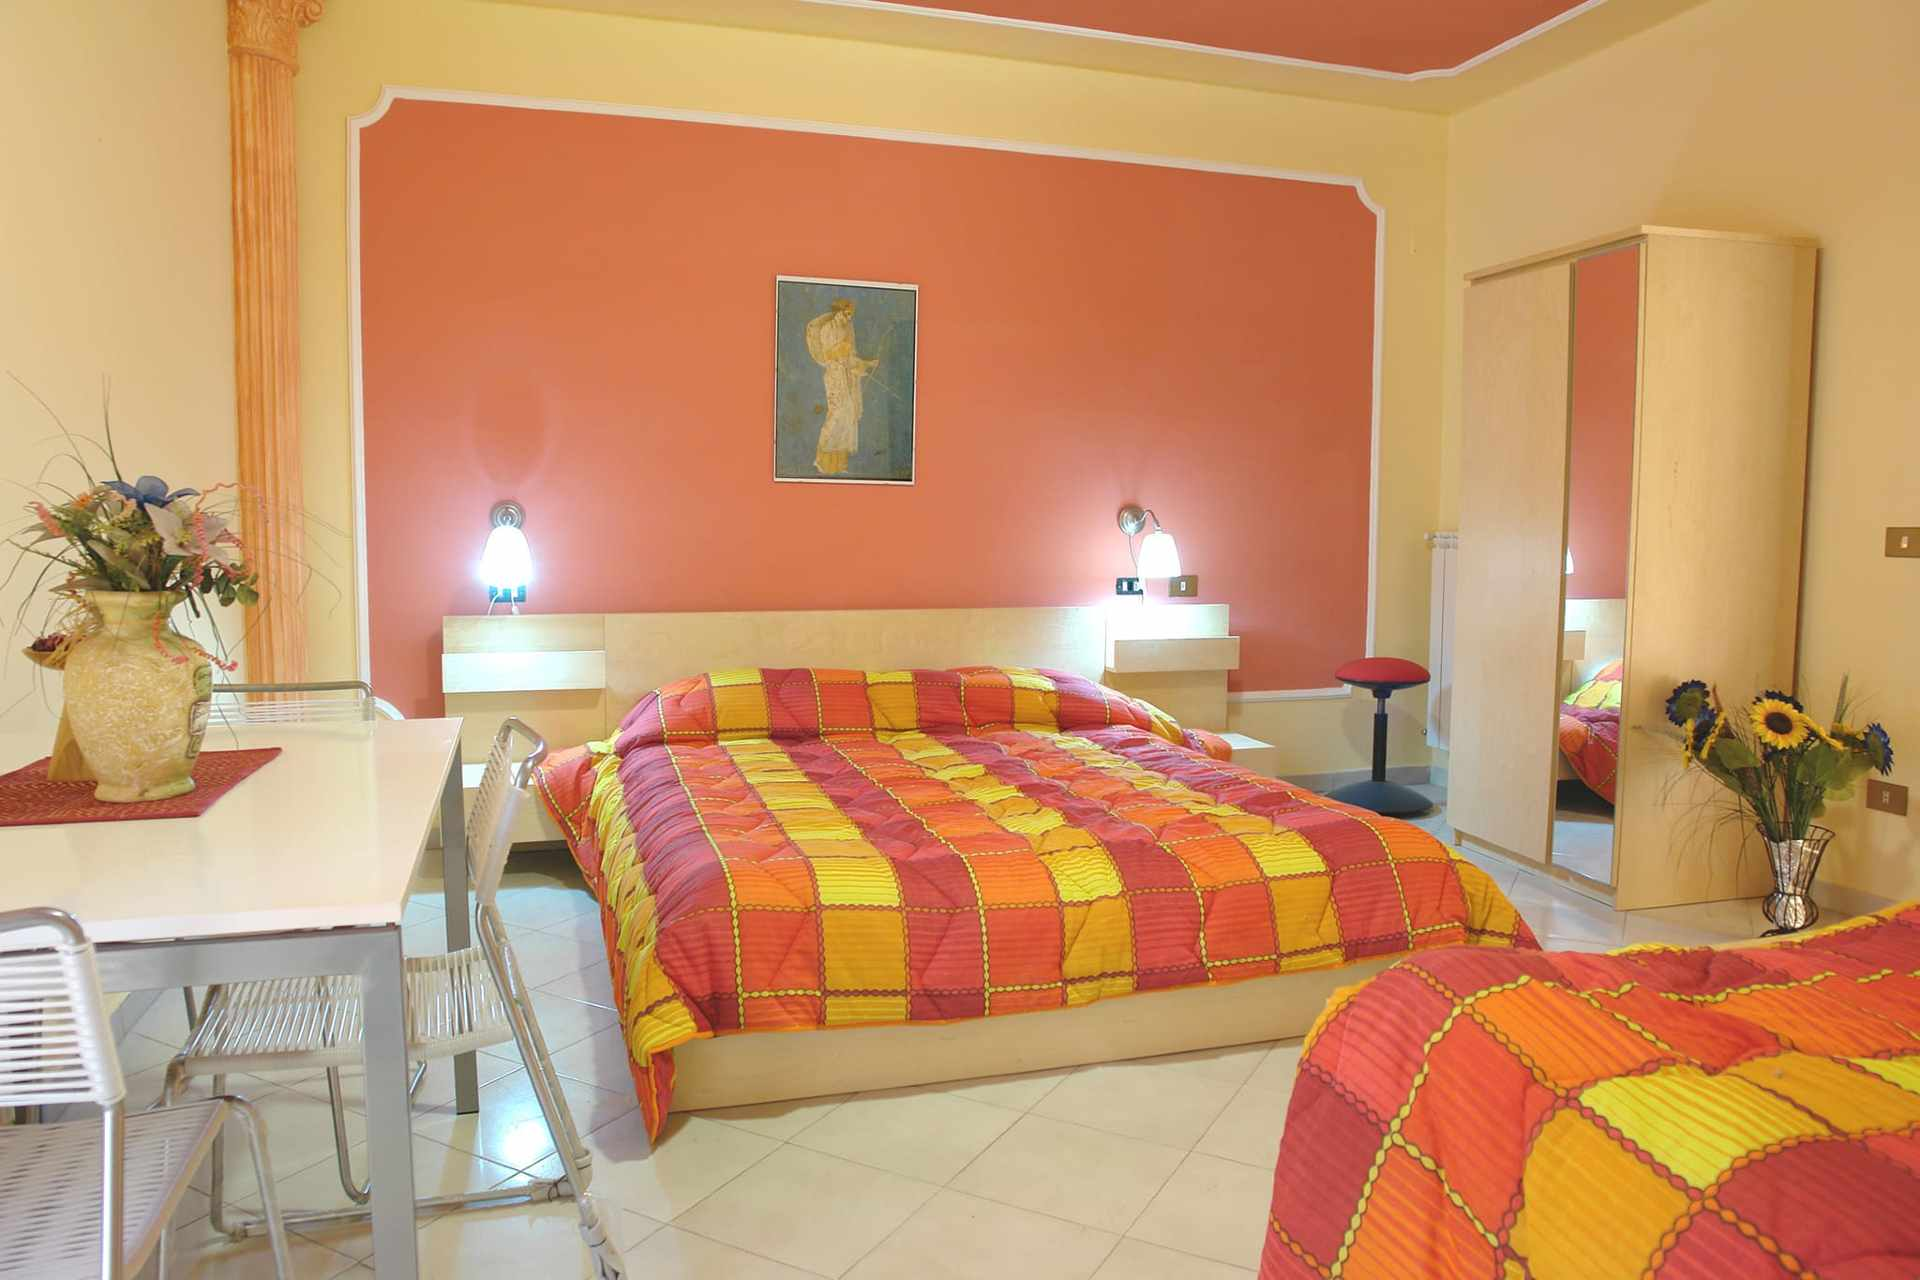 case-vacanze-bed-breakfast-pompei-cave-canem